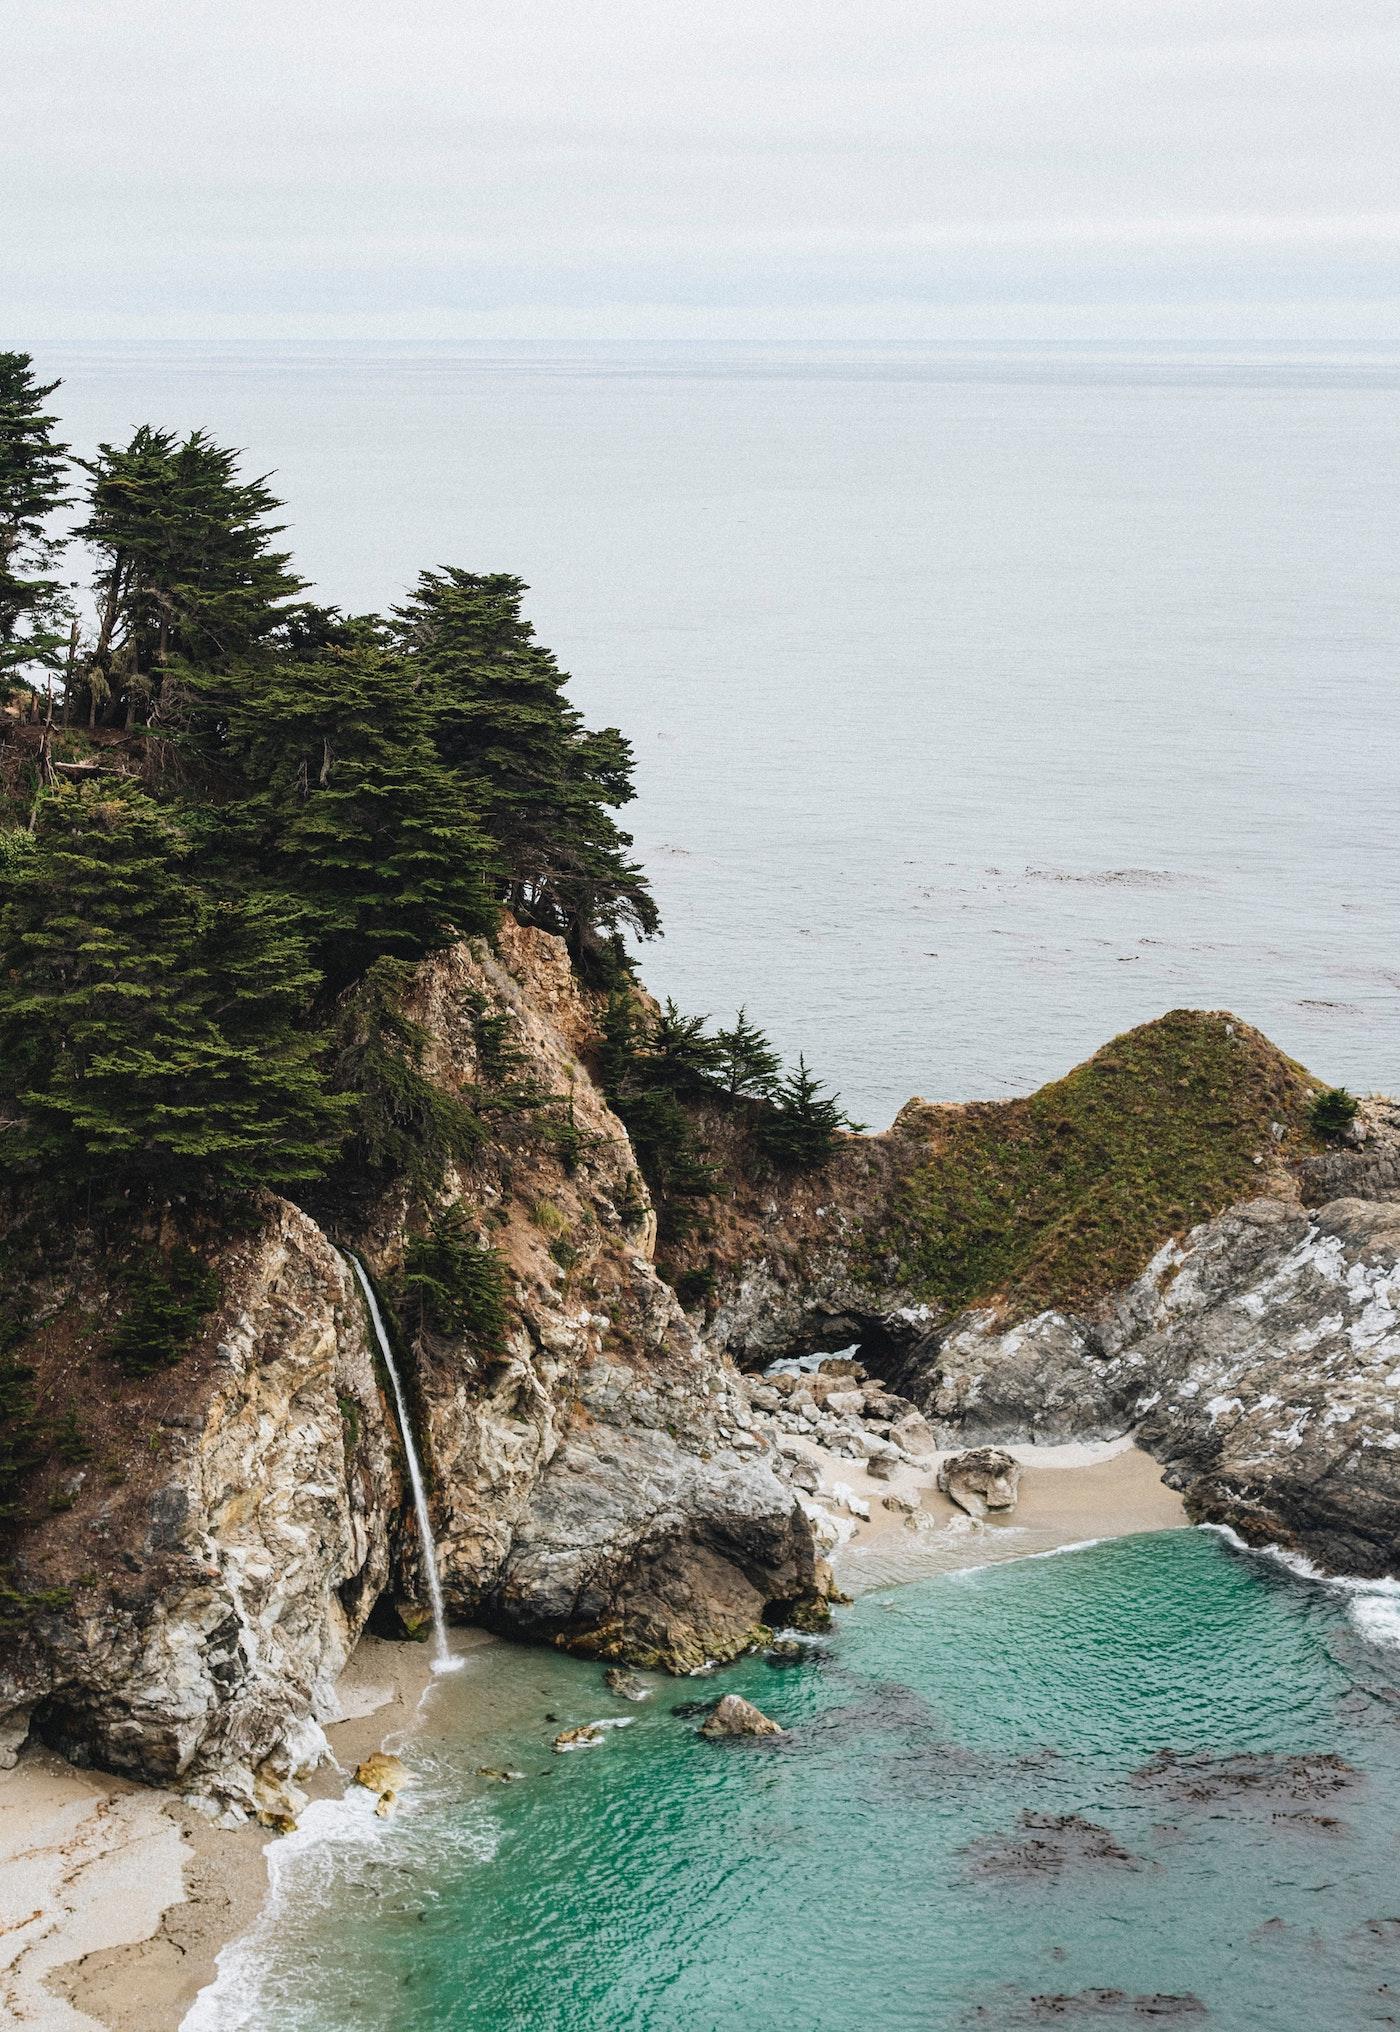 Calm Coastline